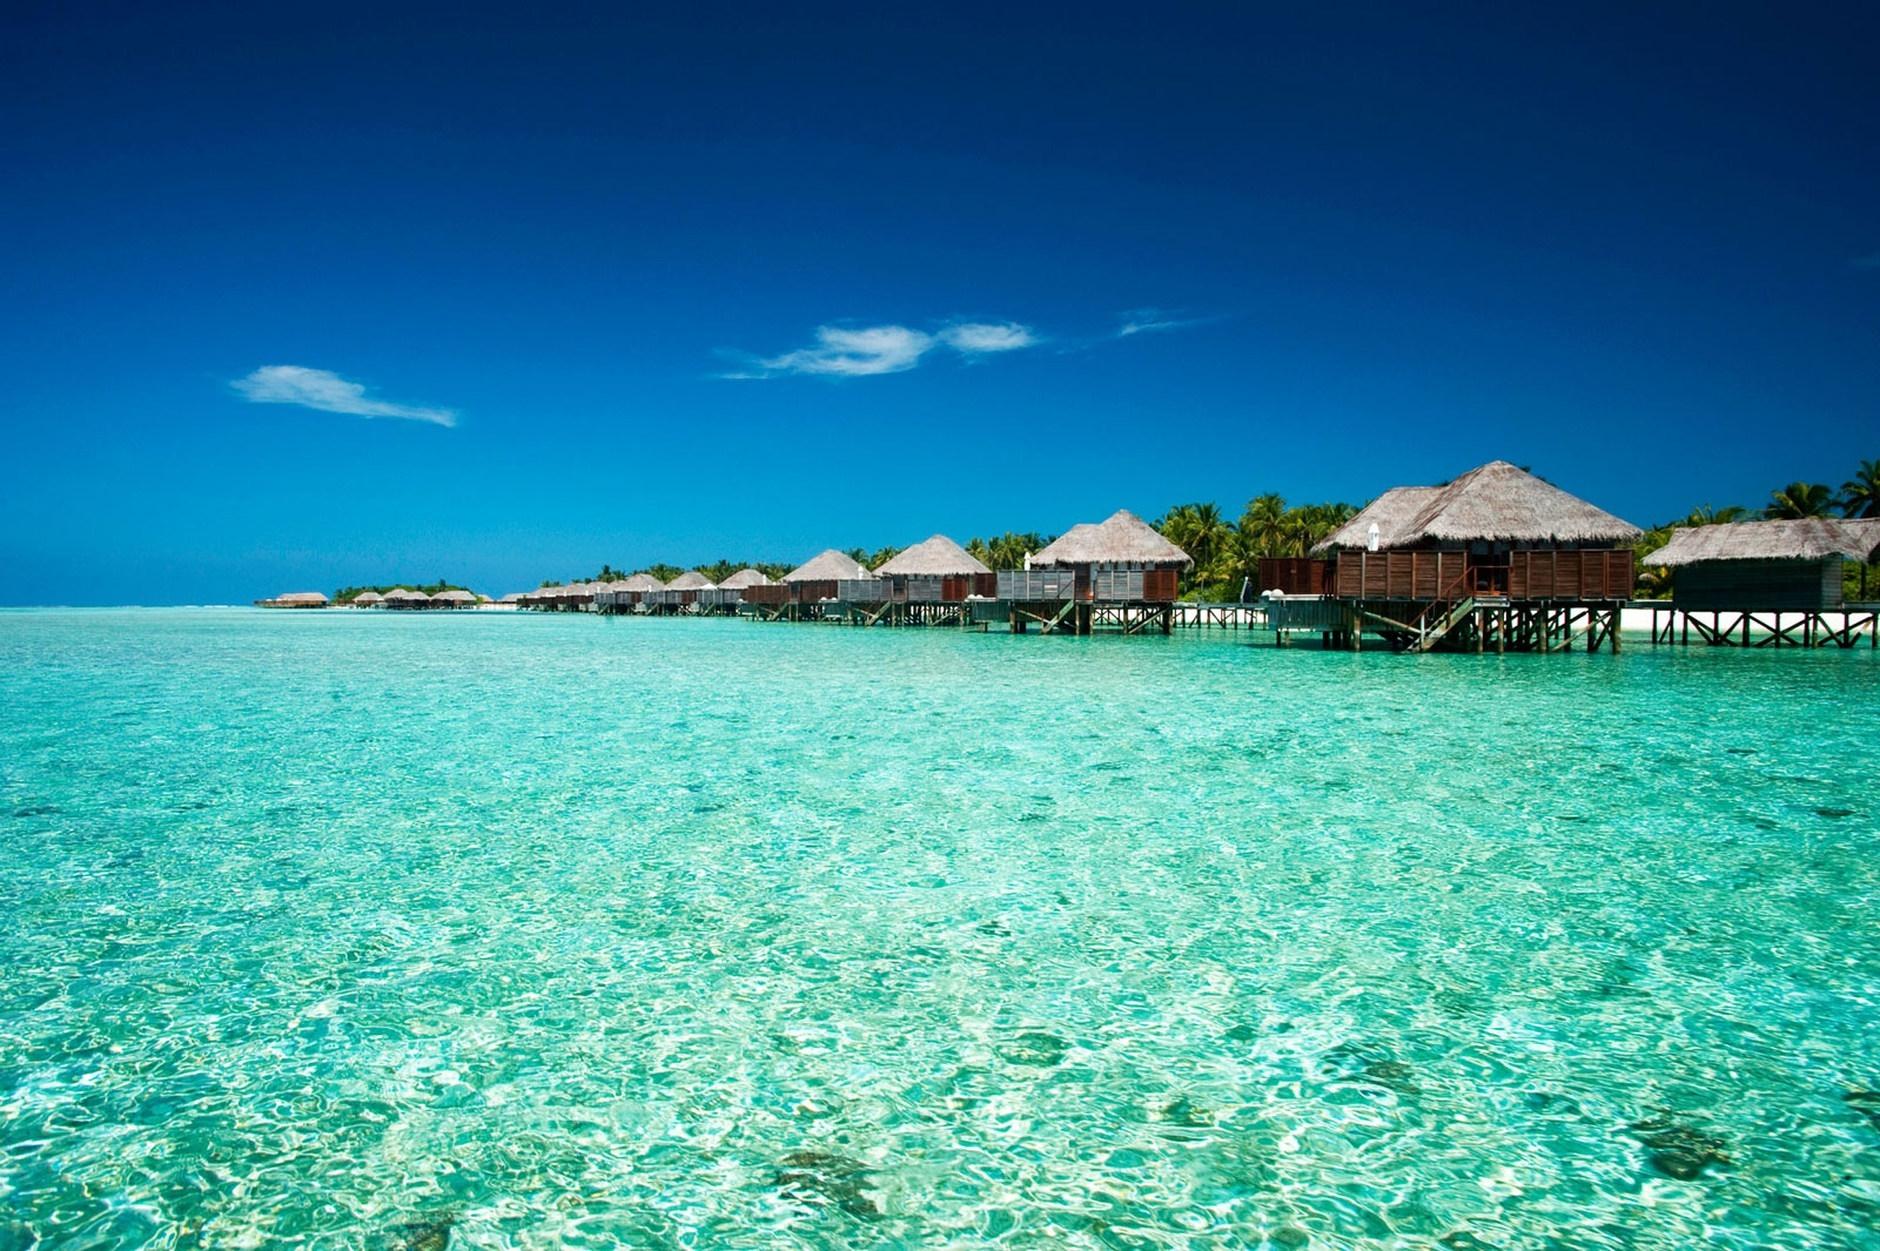 conrad maldives rangali island karmatrendz